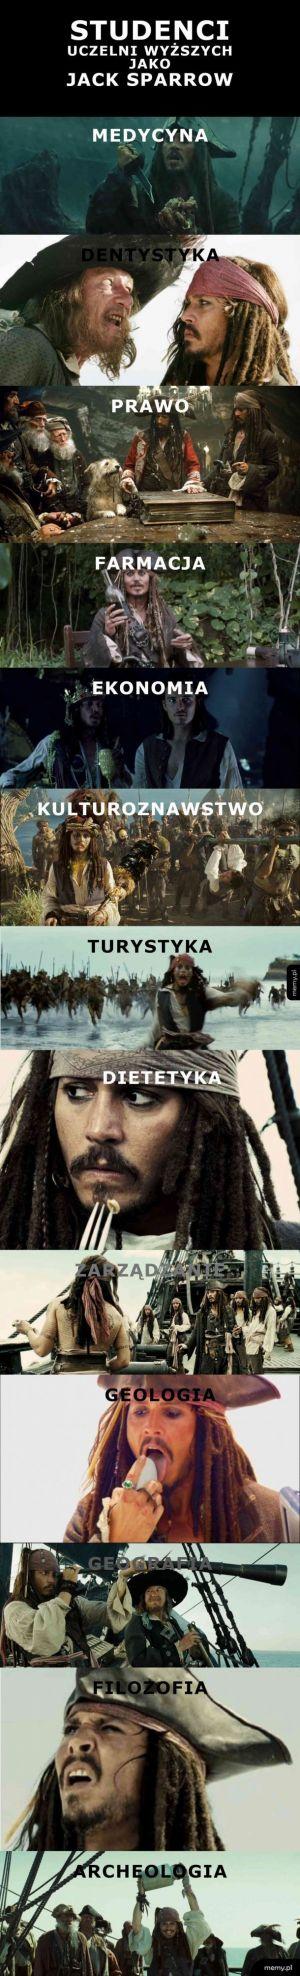 Studenci jako Jack Sparrow